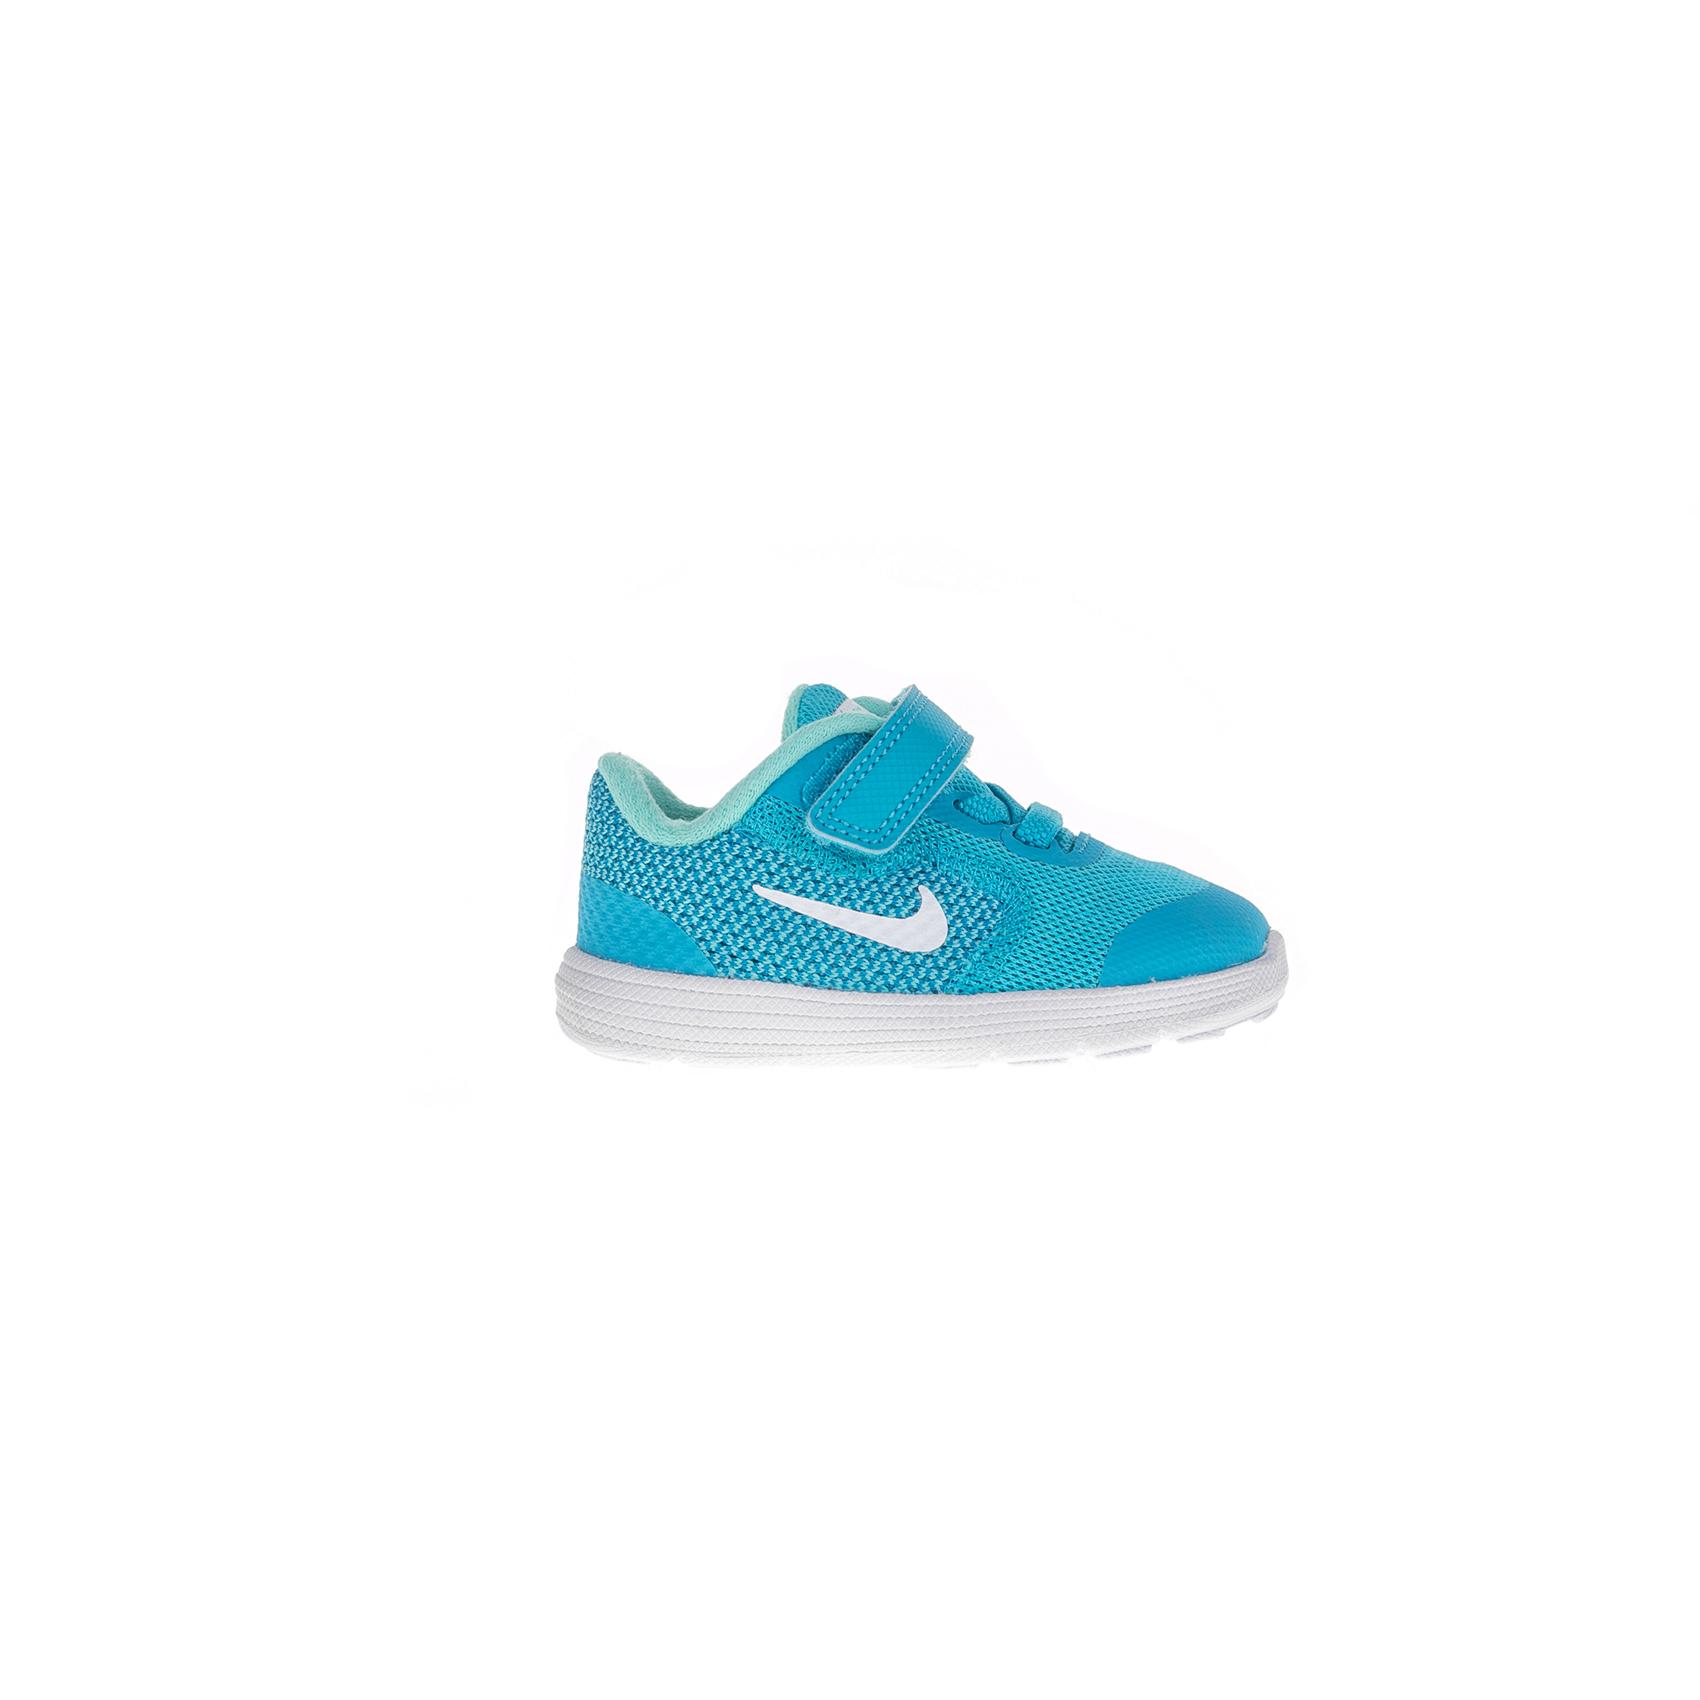 4c8c8e87b77 NIKE – Βρεφικά αθλητικά παπούτσια Nike REVOLUTION 3 (TDV) μπλε